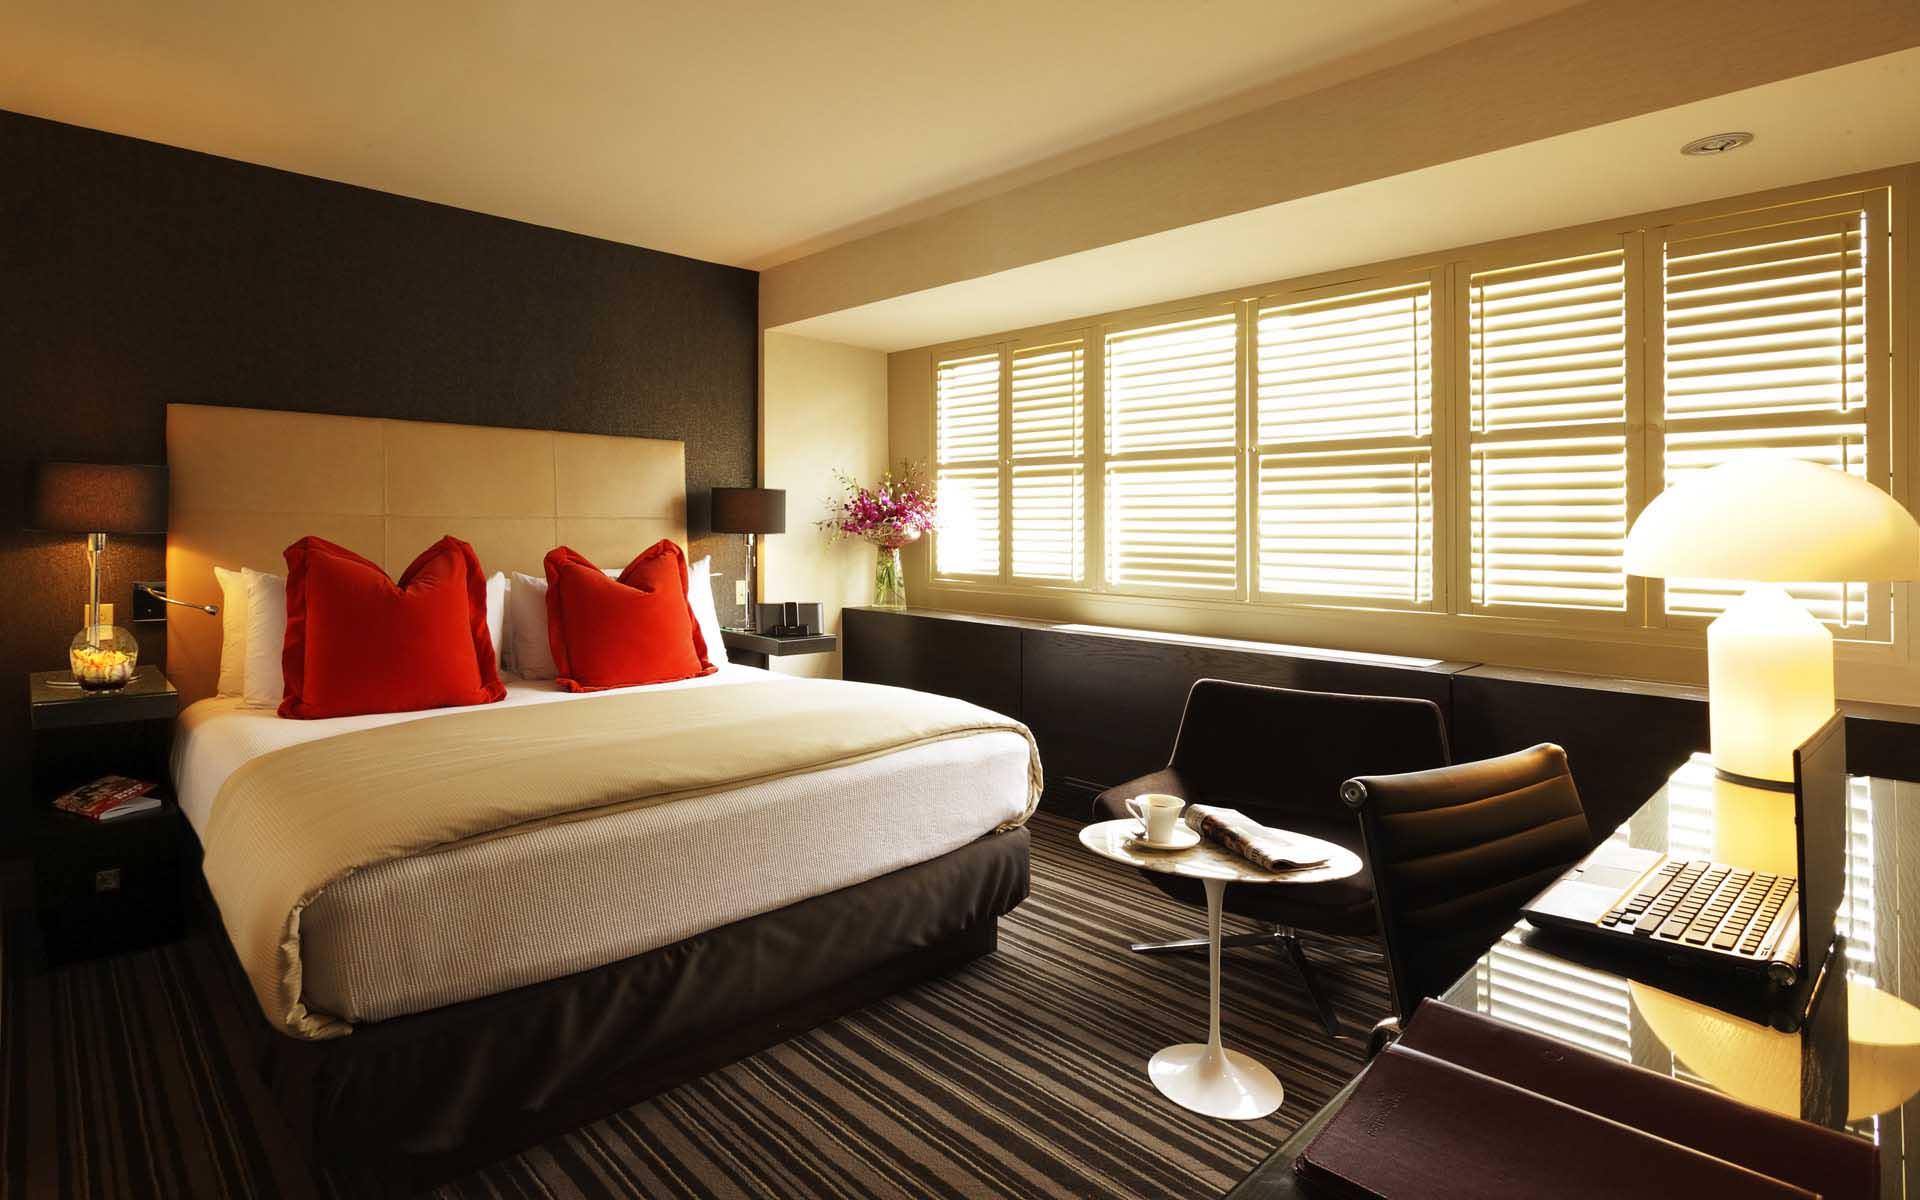 Bedroom Romantic Ideas Best Gorgeous Preparation